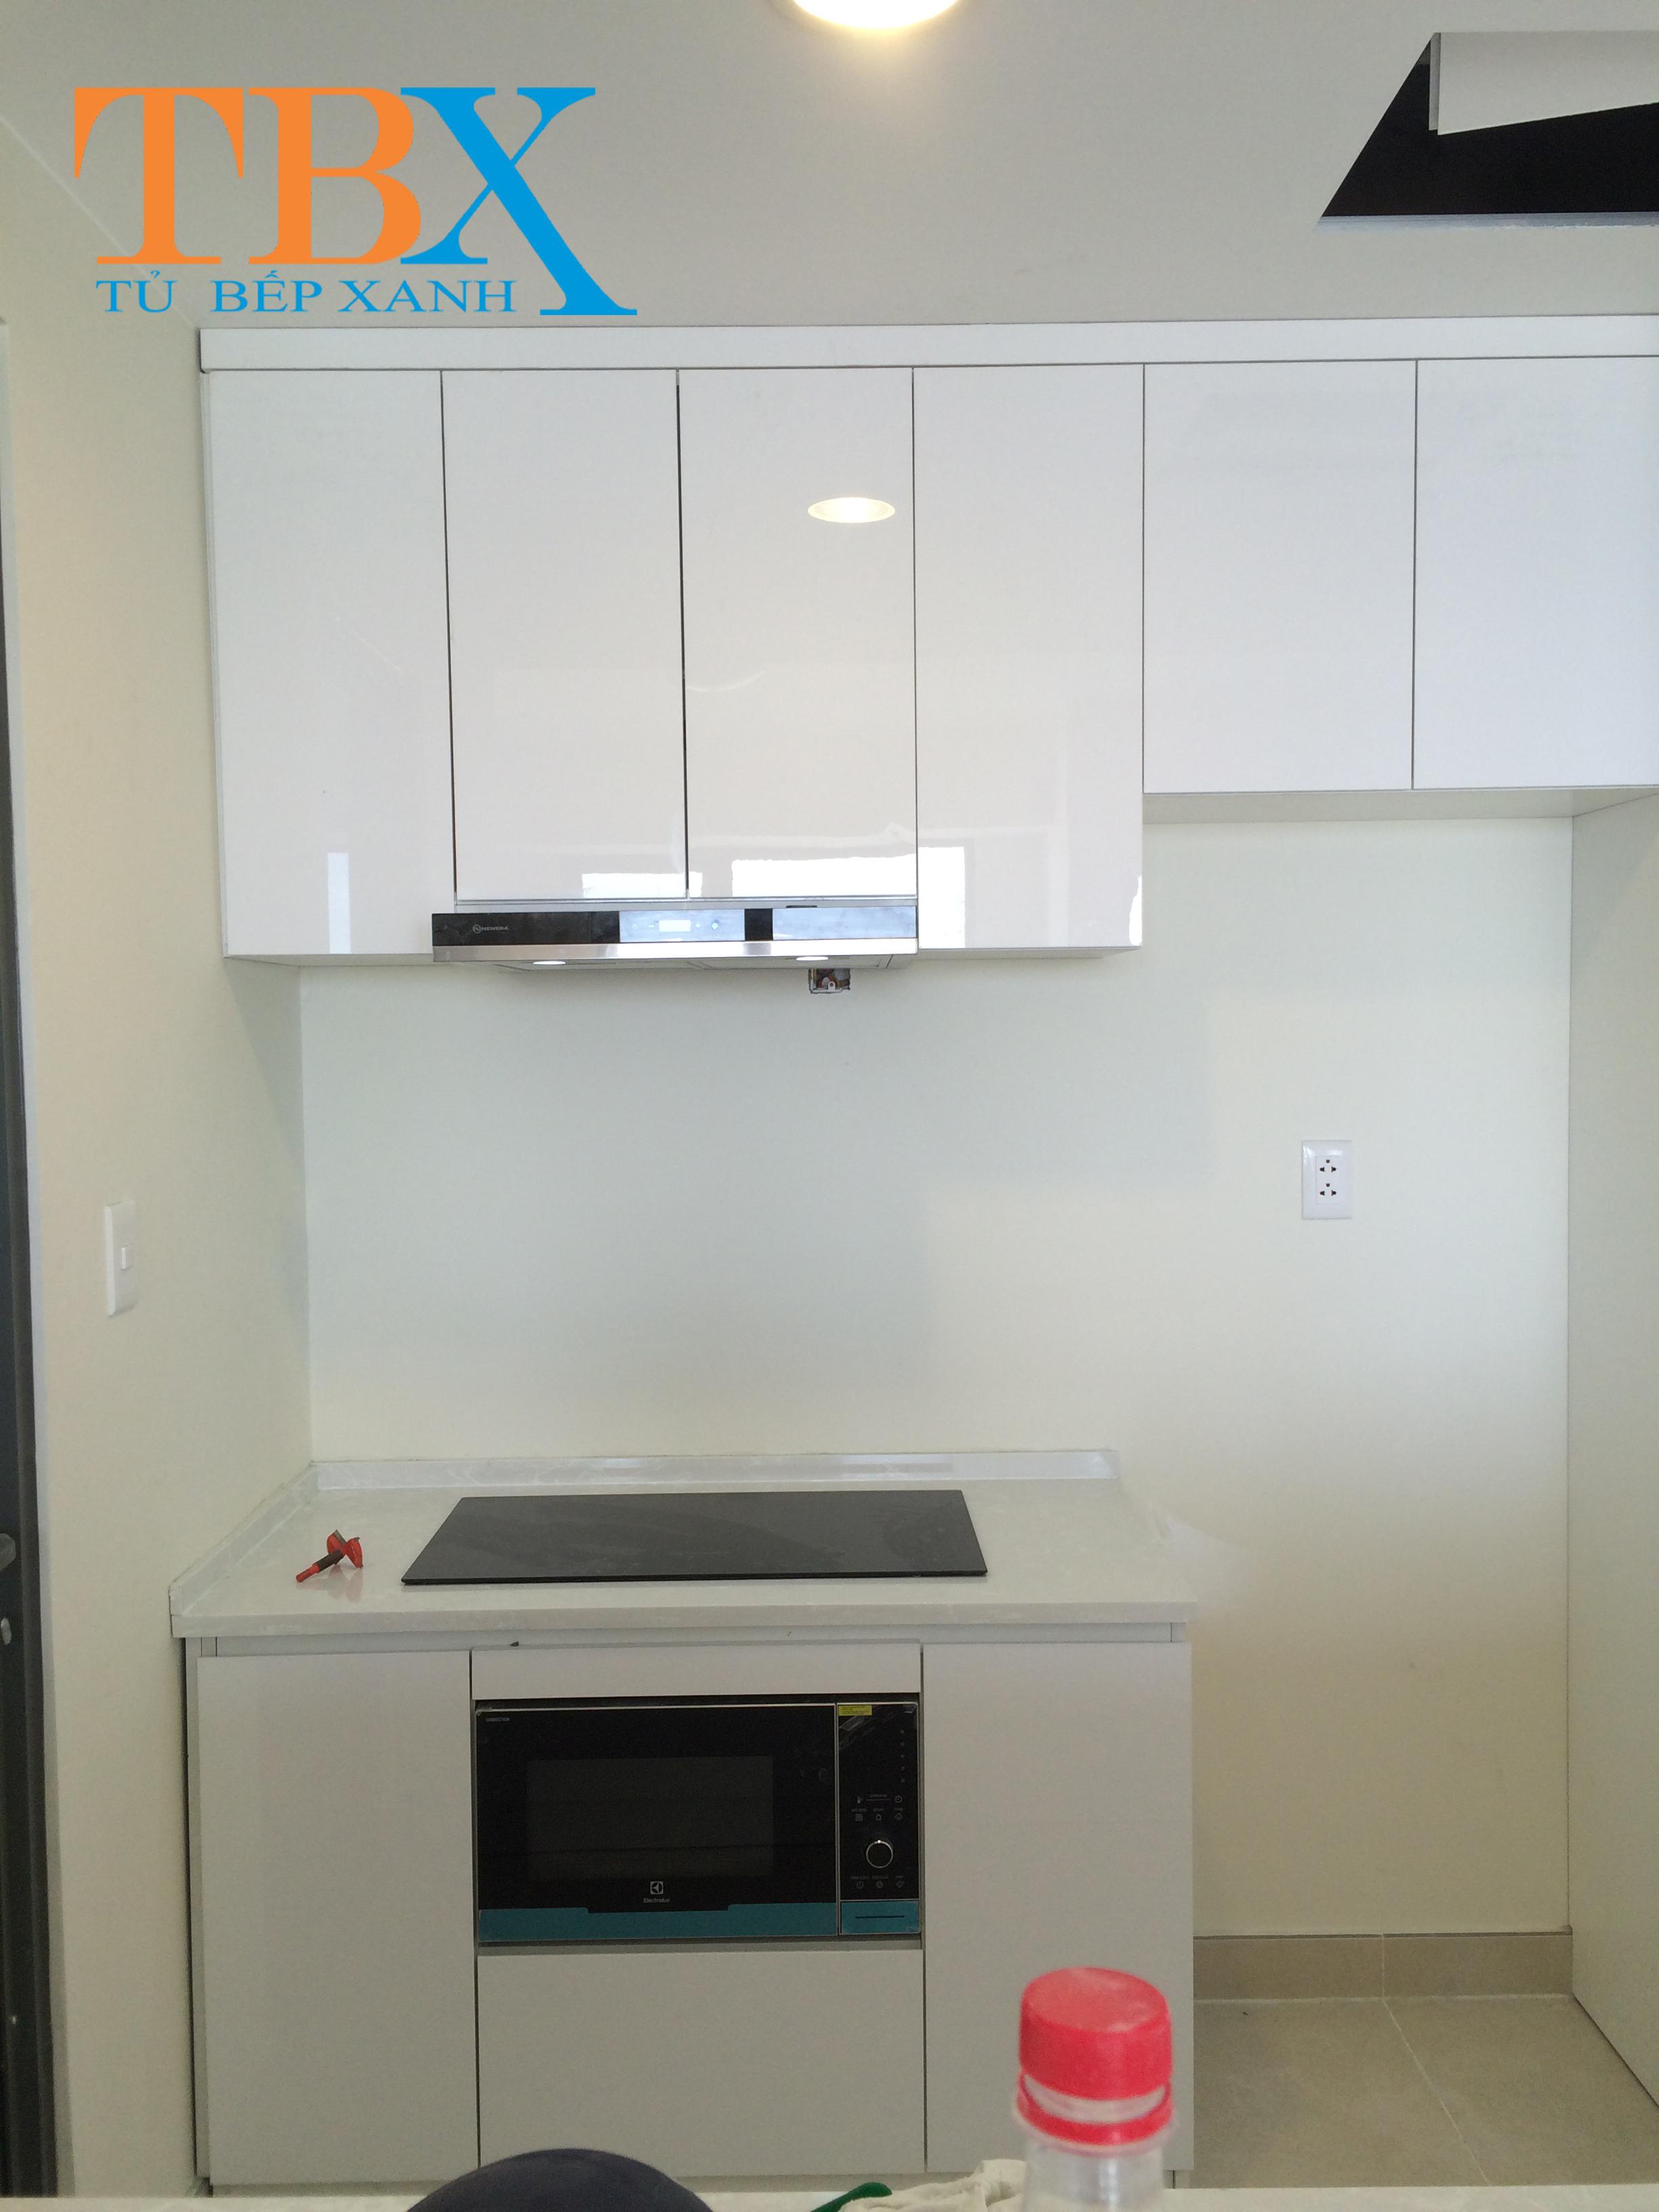 tủ bếp quận 2 đẹp acrylic